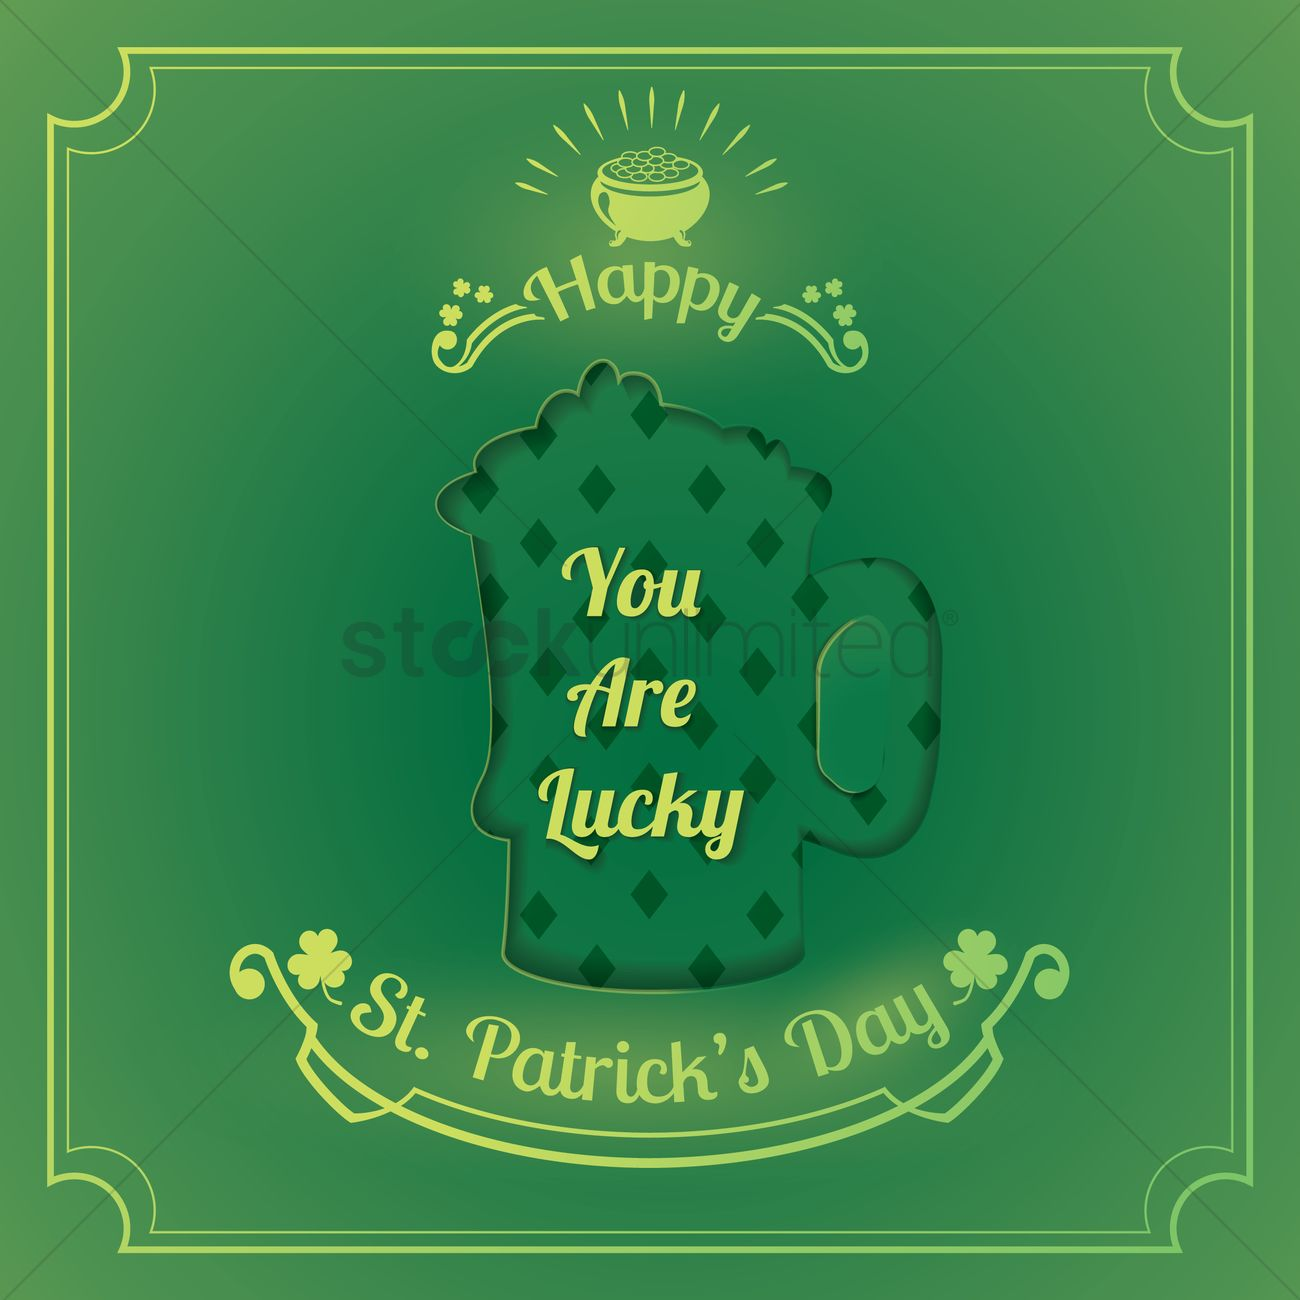 Saint Patricks Day Greeting Vector Image 1959487 Stockunlimited